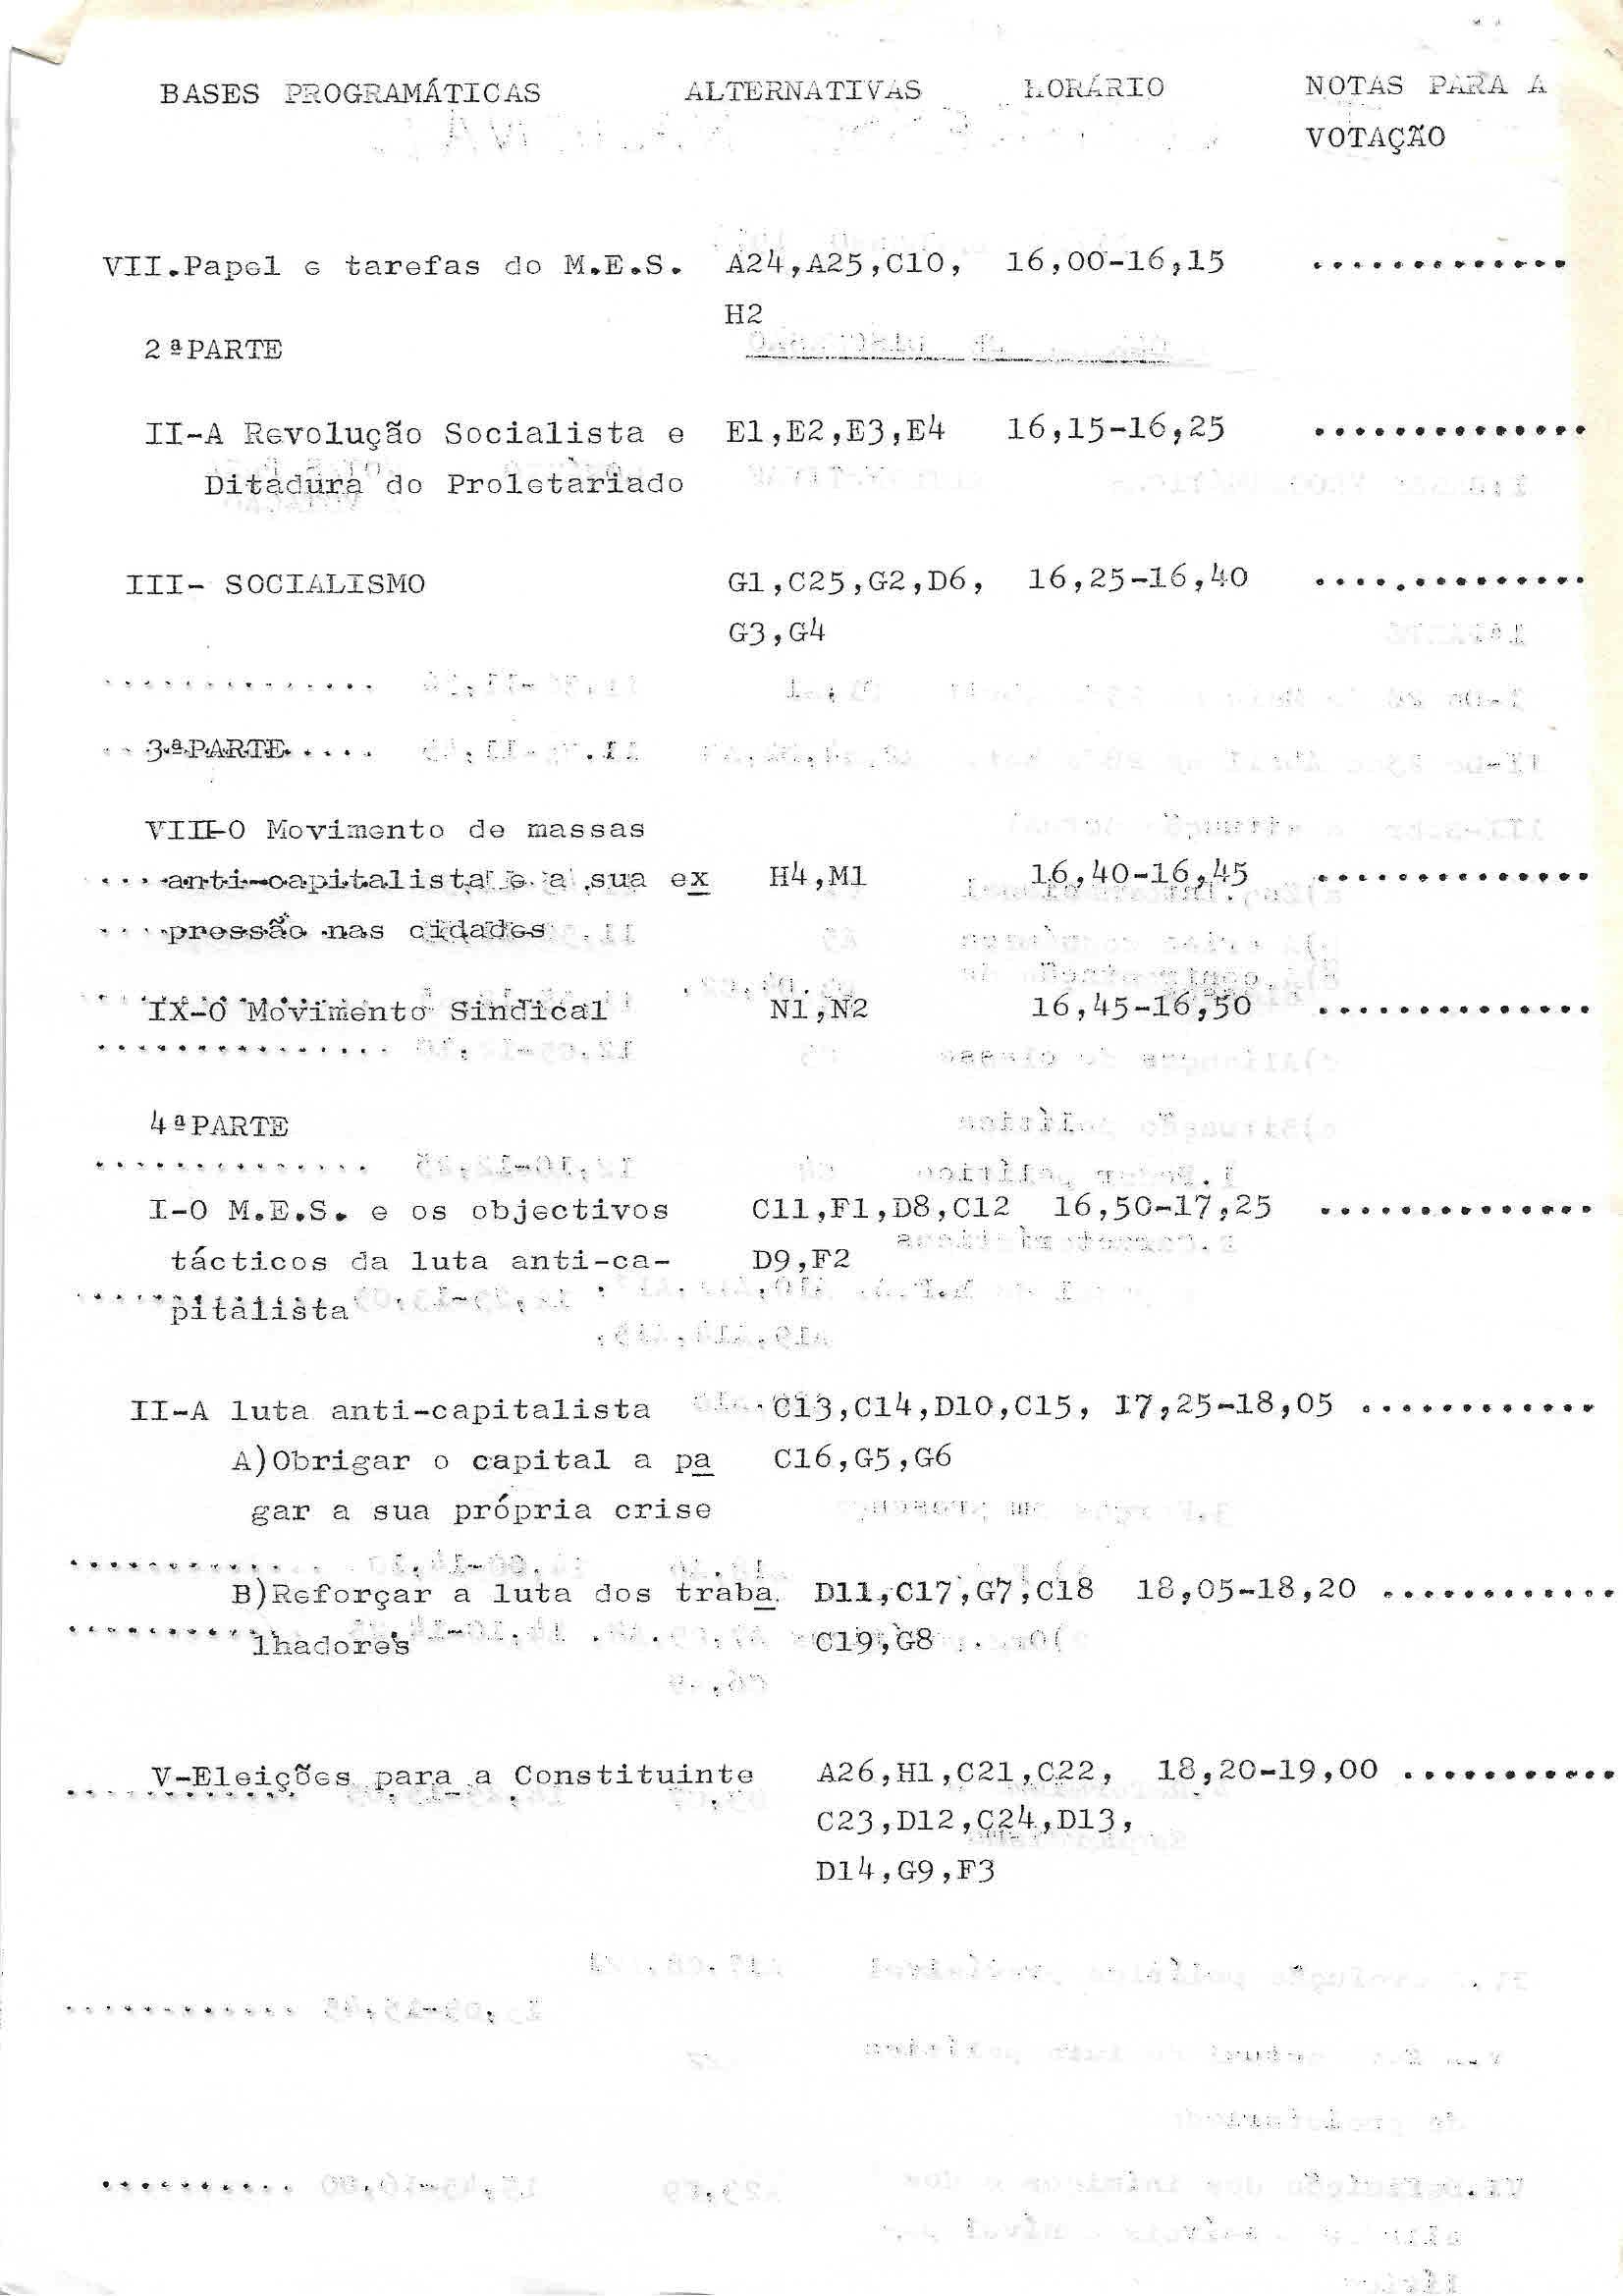 scanVVVV (8)